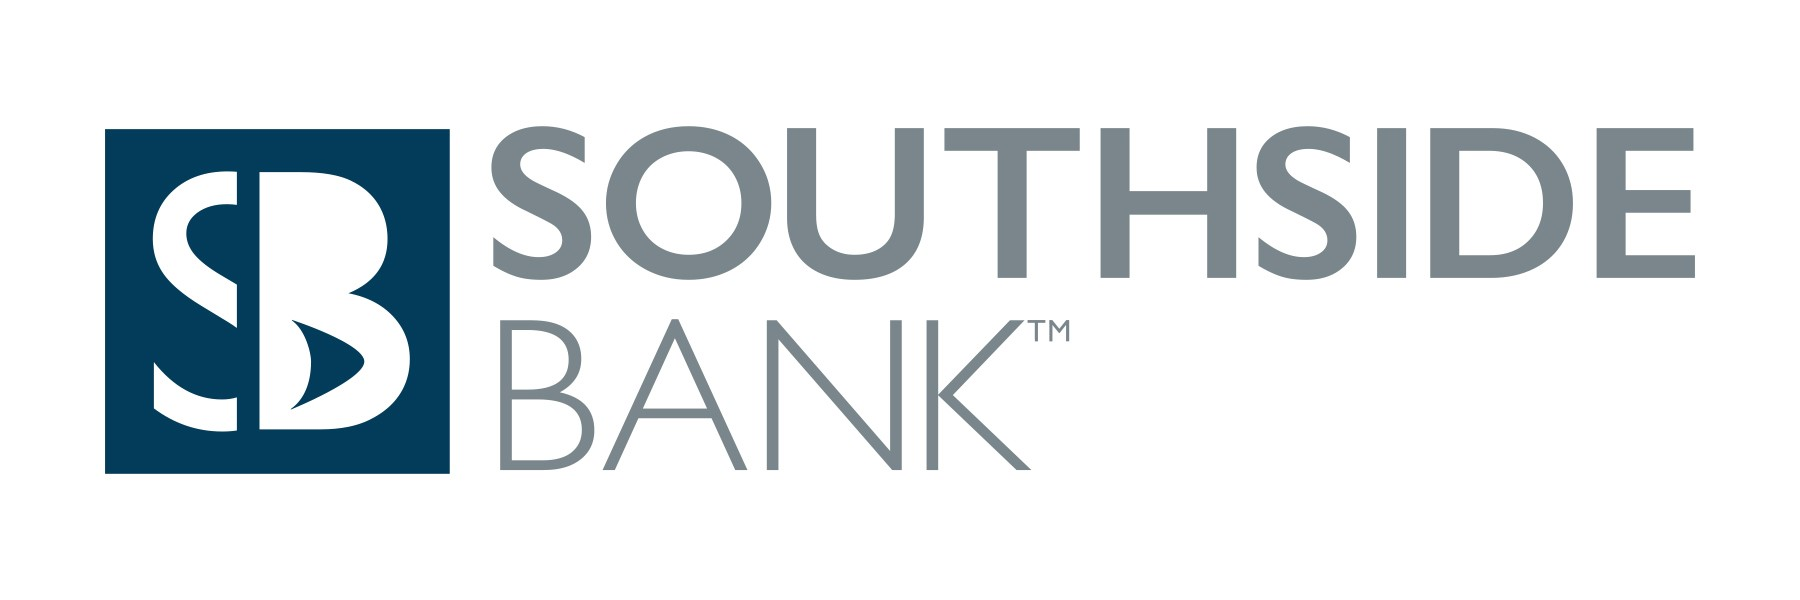 Northeast Texas - Southside Bank logo